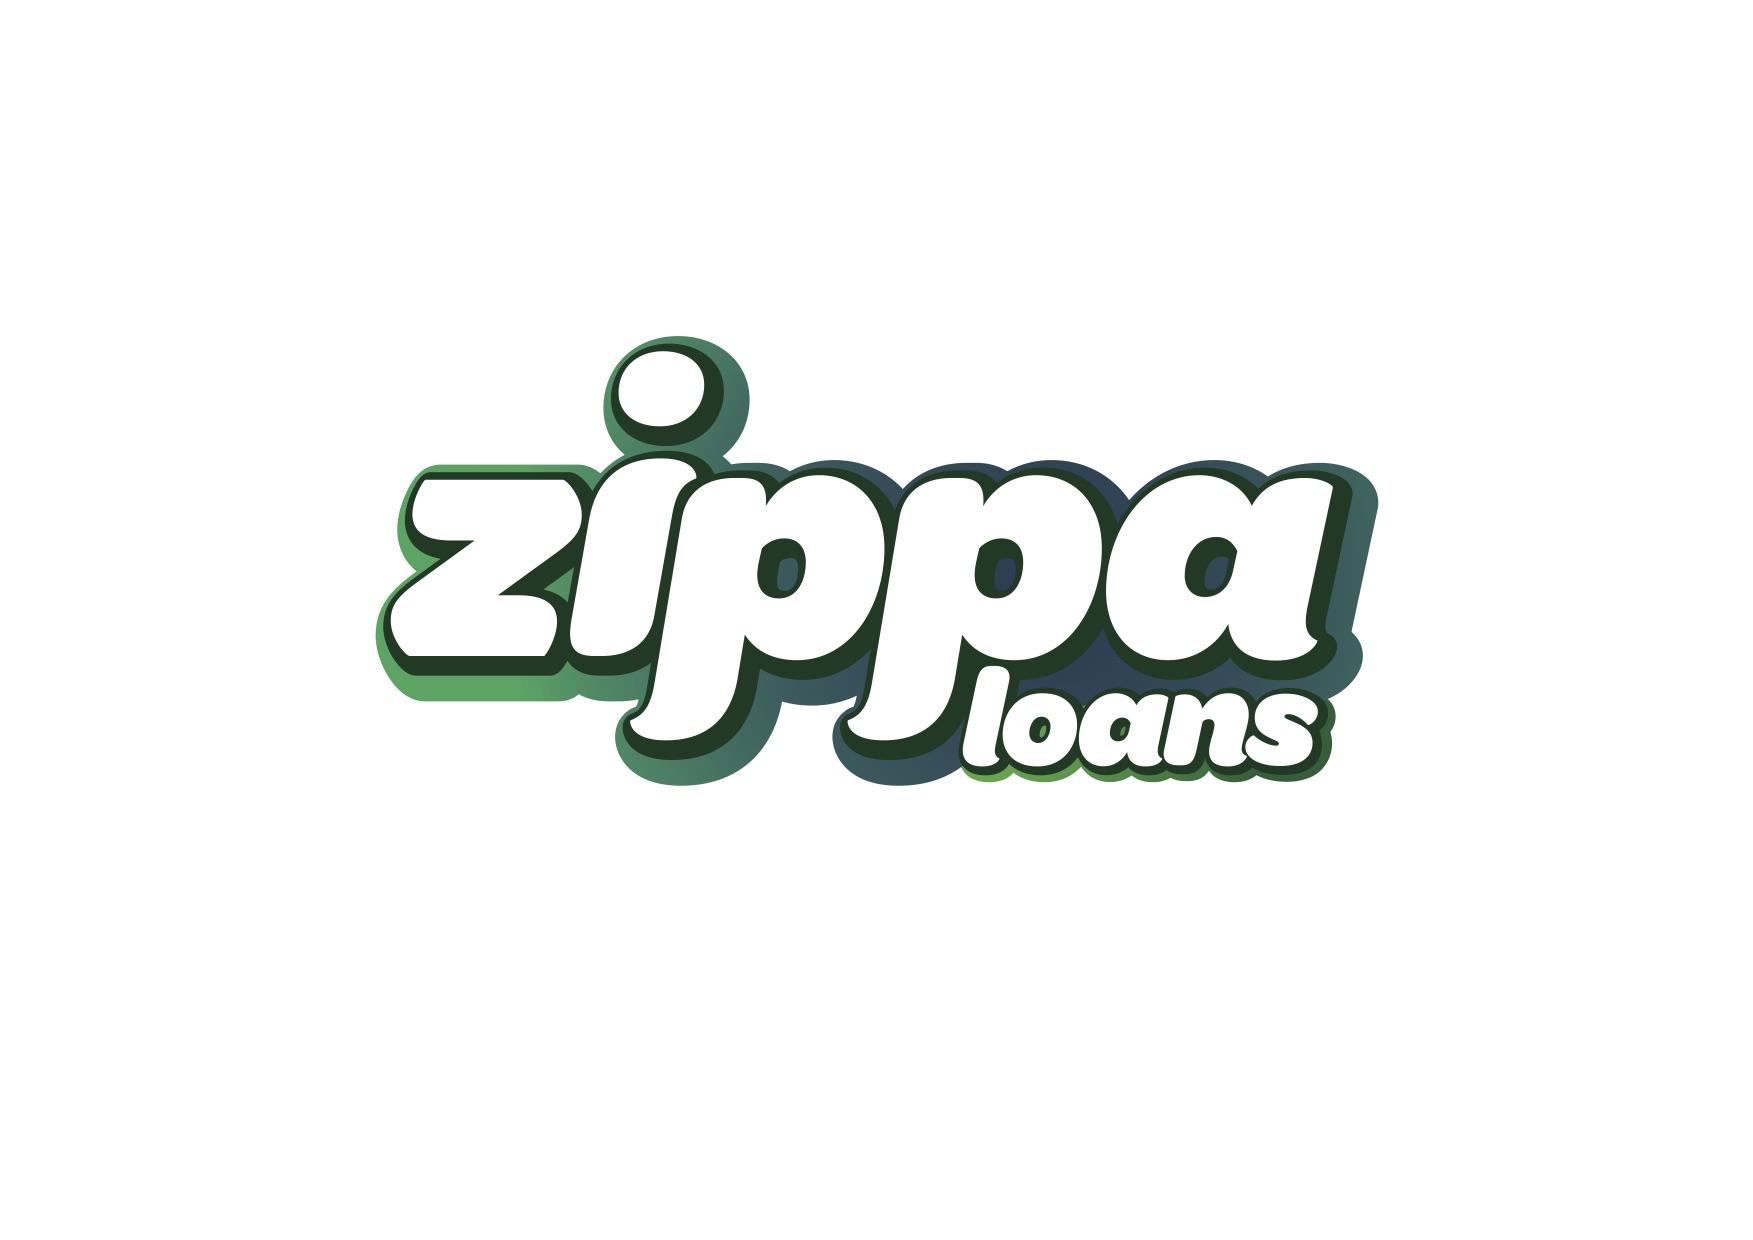 Zippa logo